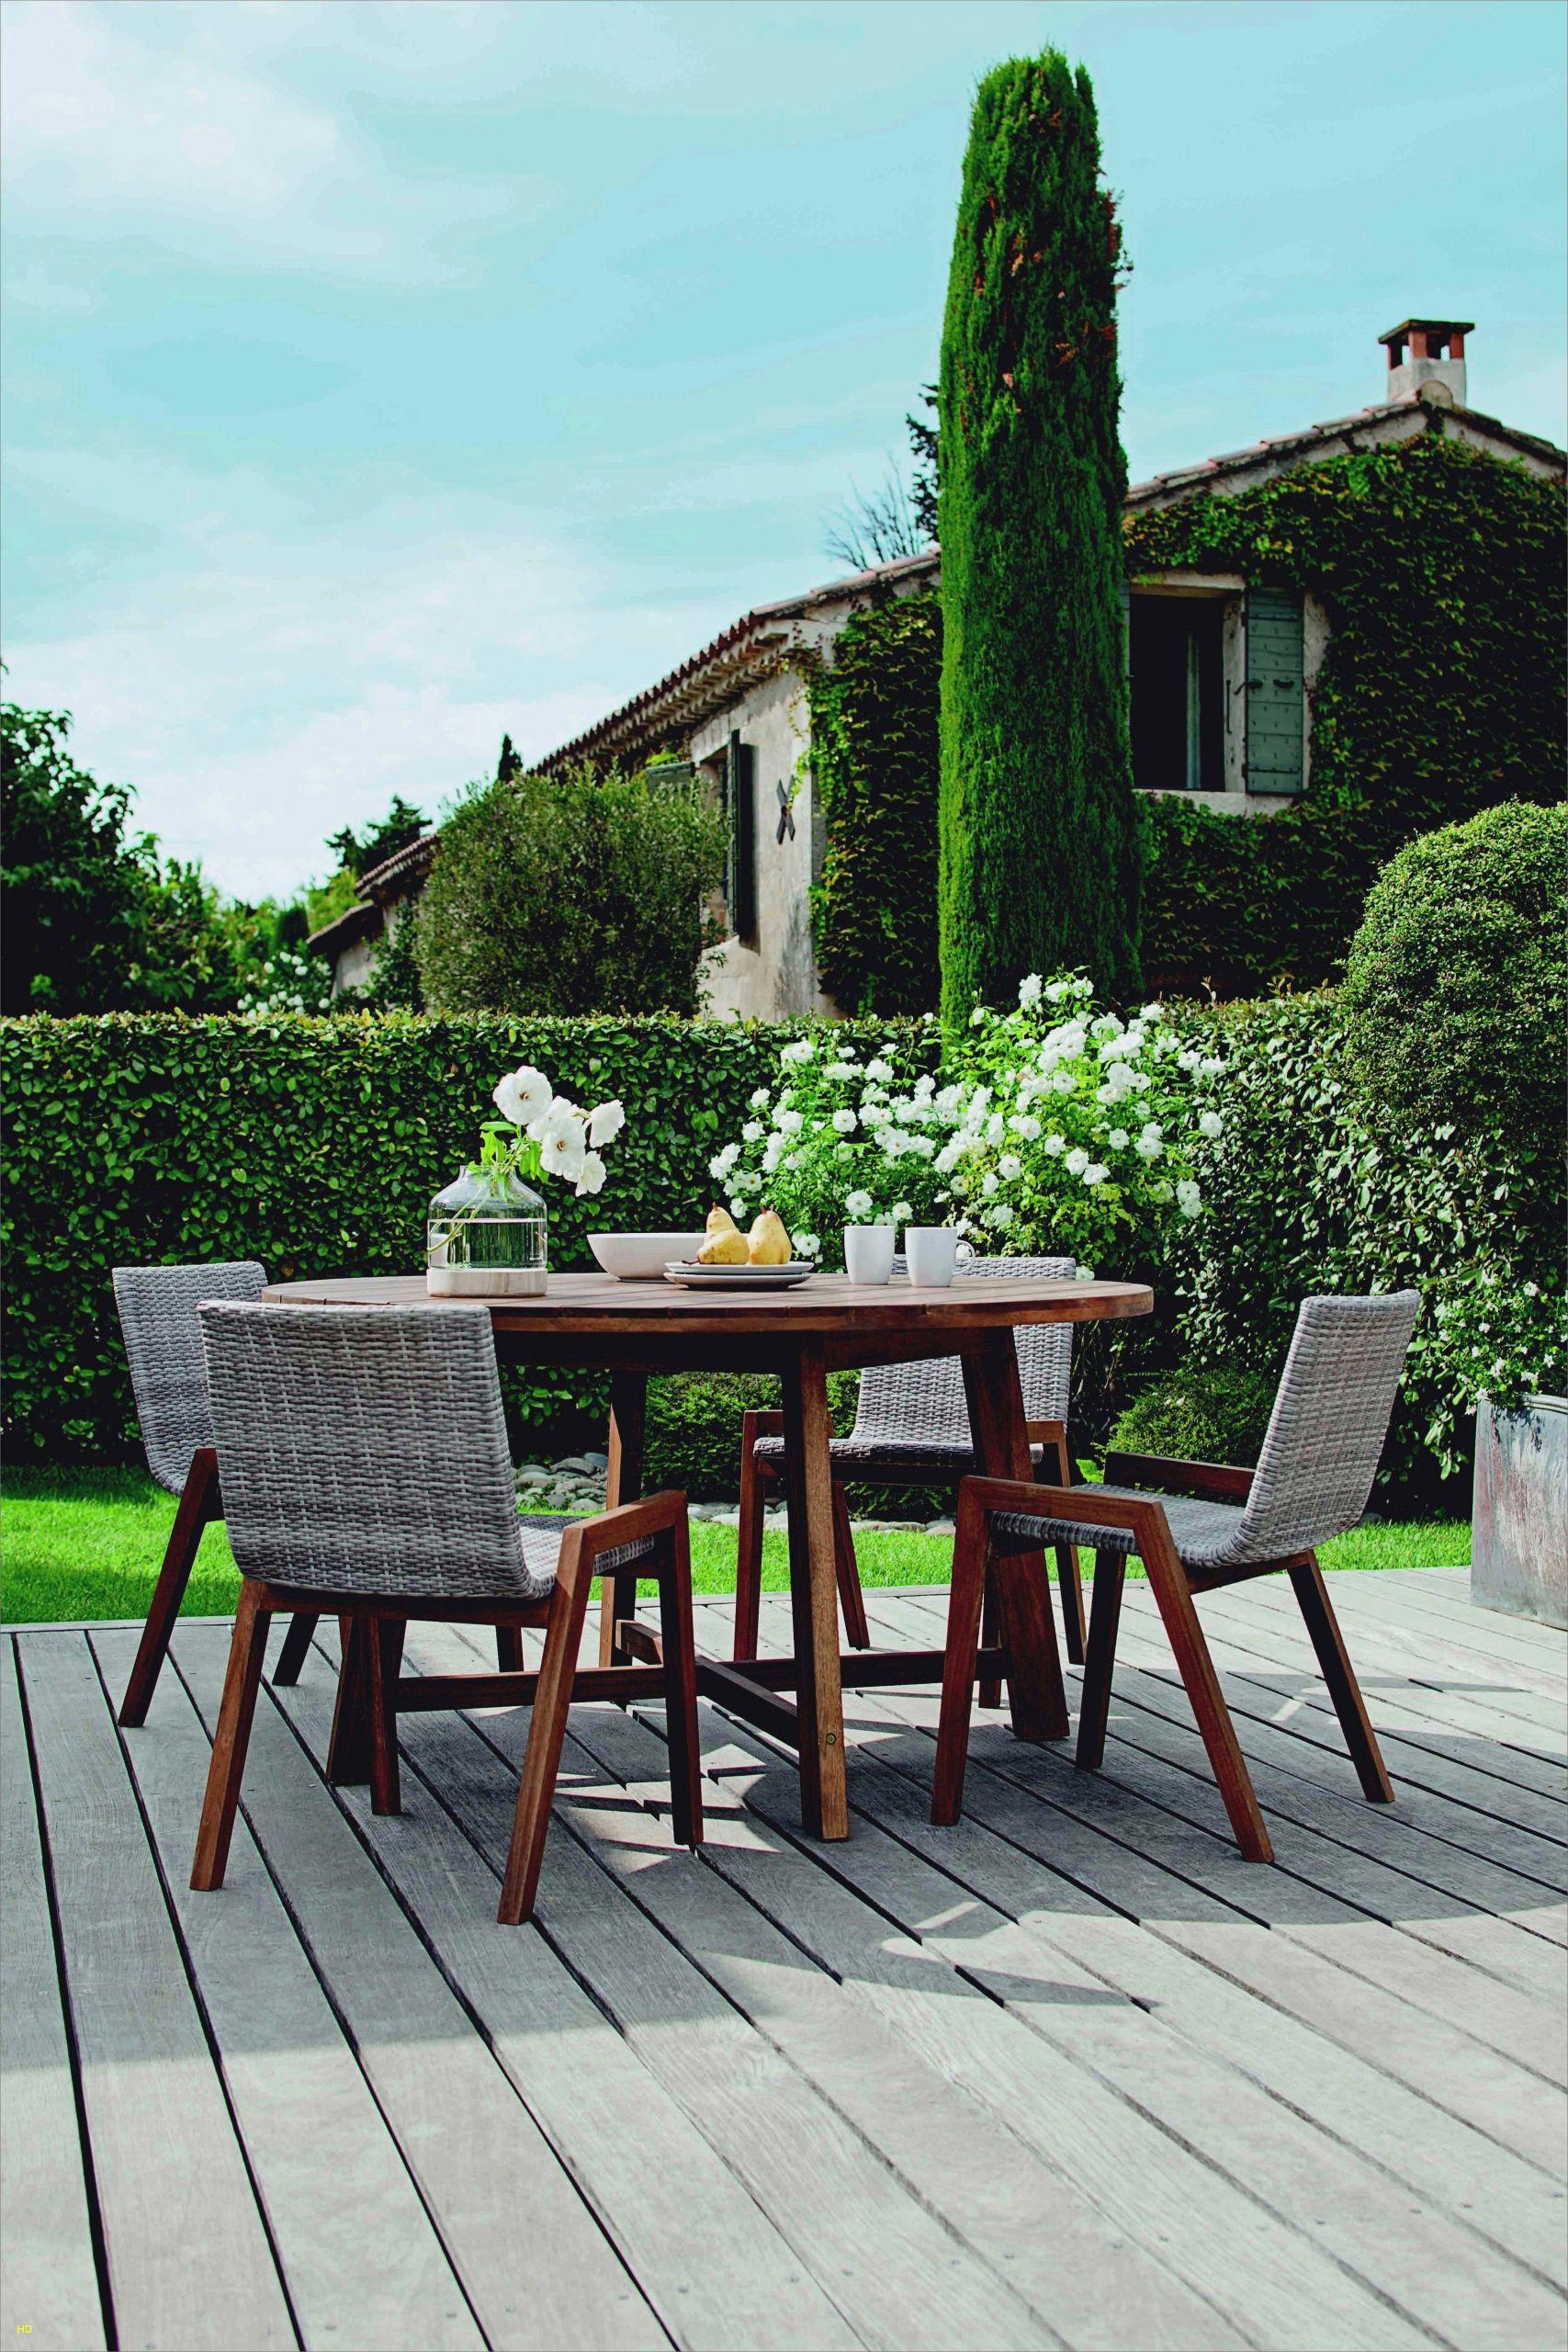 Solde Salon Jardin Best Of Salon De Jardin Leclerc Catalogue ... tout Salon Jardin Pas Cher Leclerc